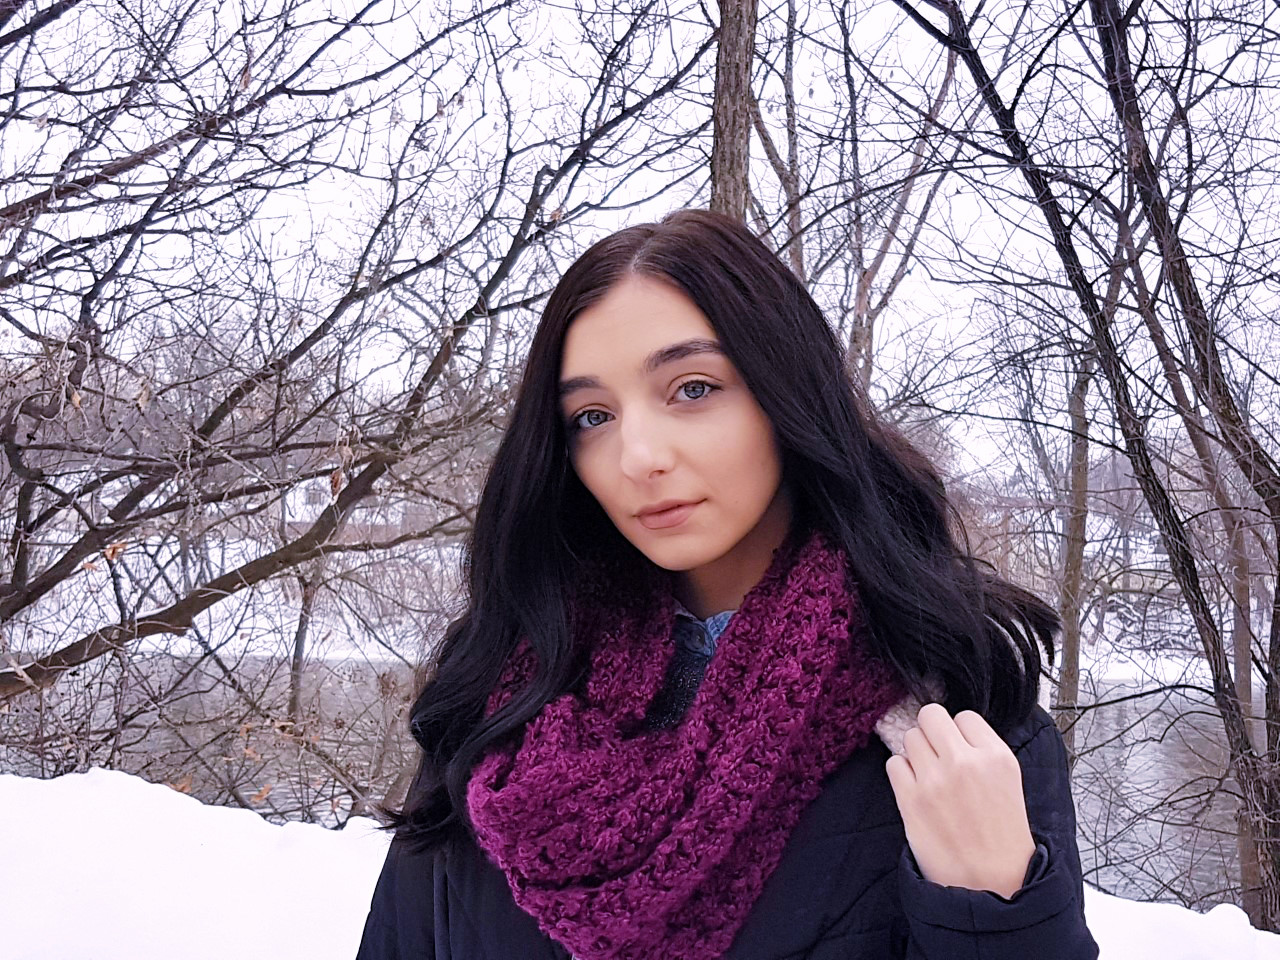 haircare, short hair, tips, beauty, beauty tips, head & shoulders, beauty blogger, Montreal